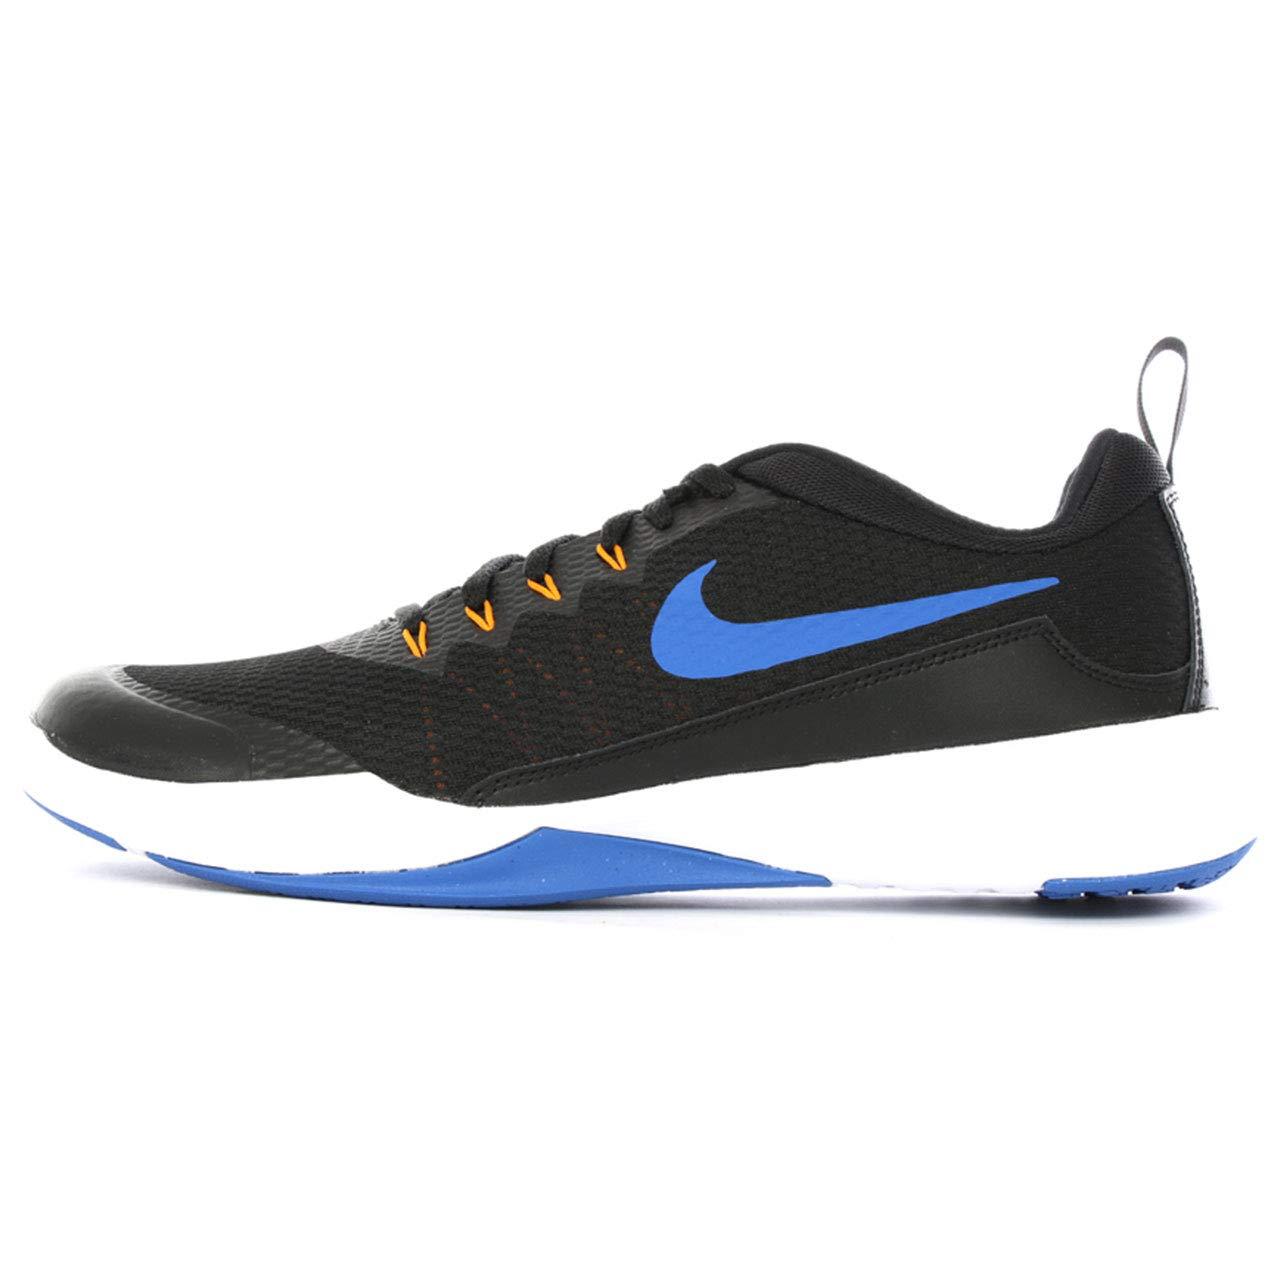 Nike Men's Legend Trainer Training Shoes – Size 8